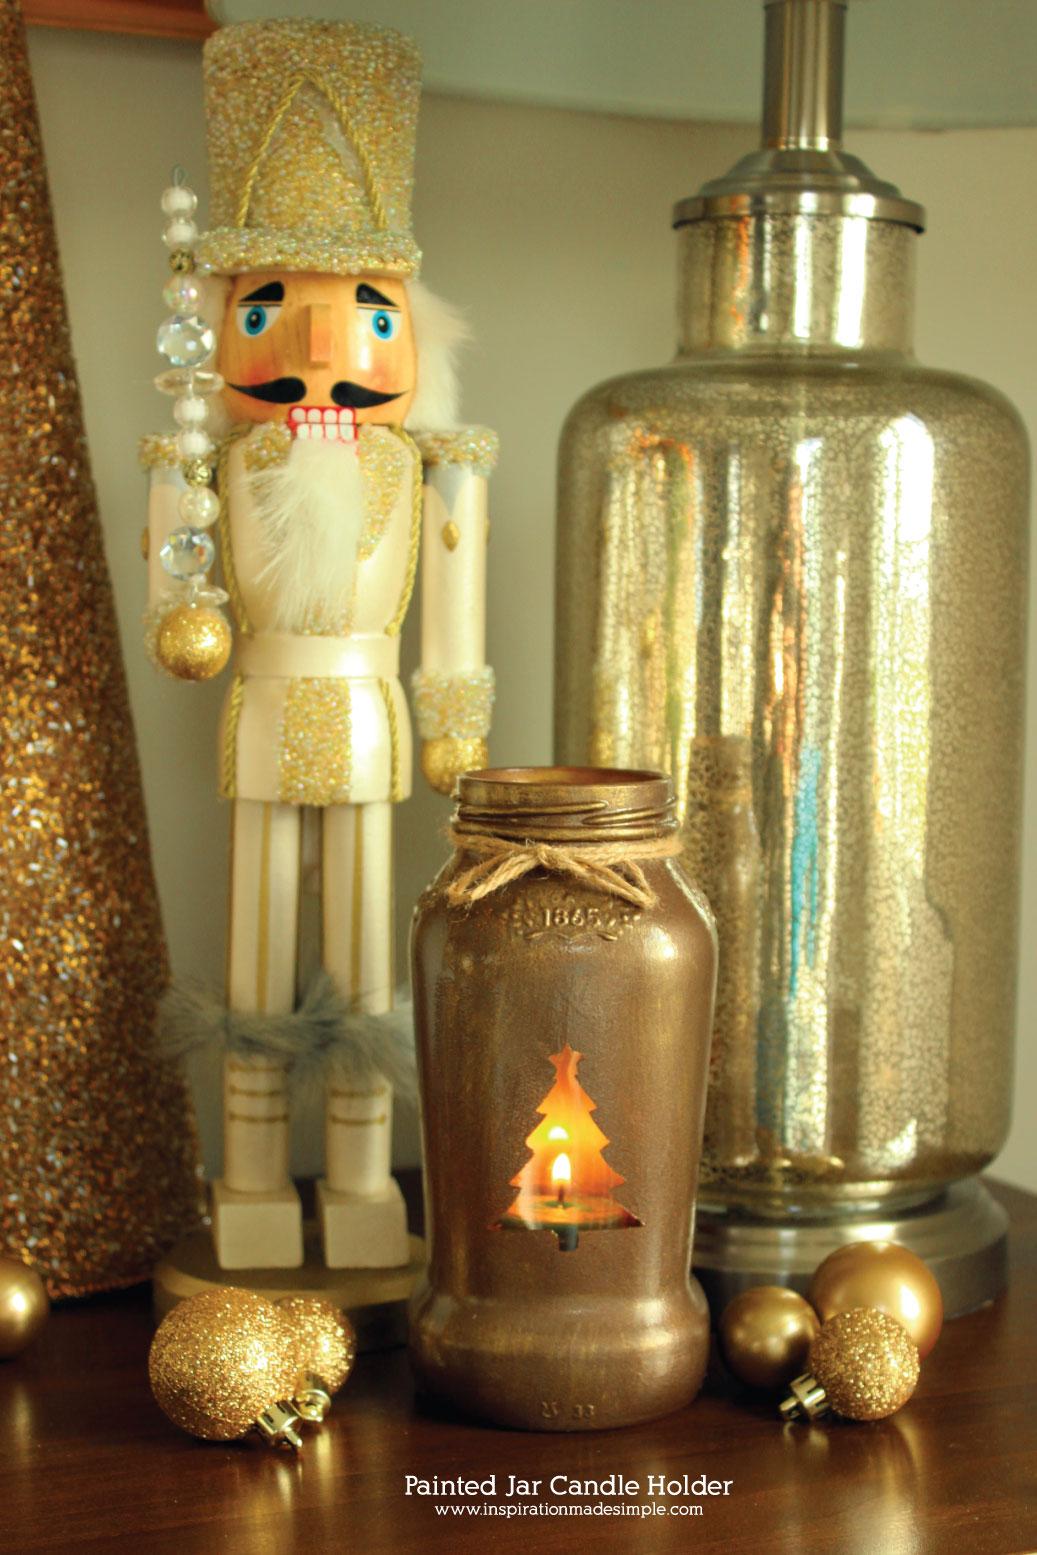 DIY Christmas Jar Candle Holder